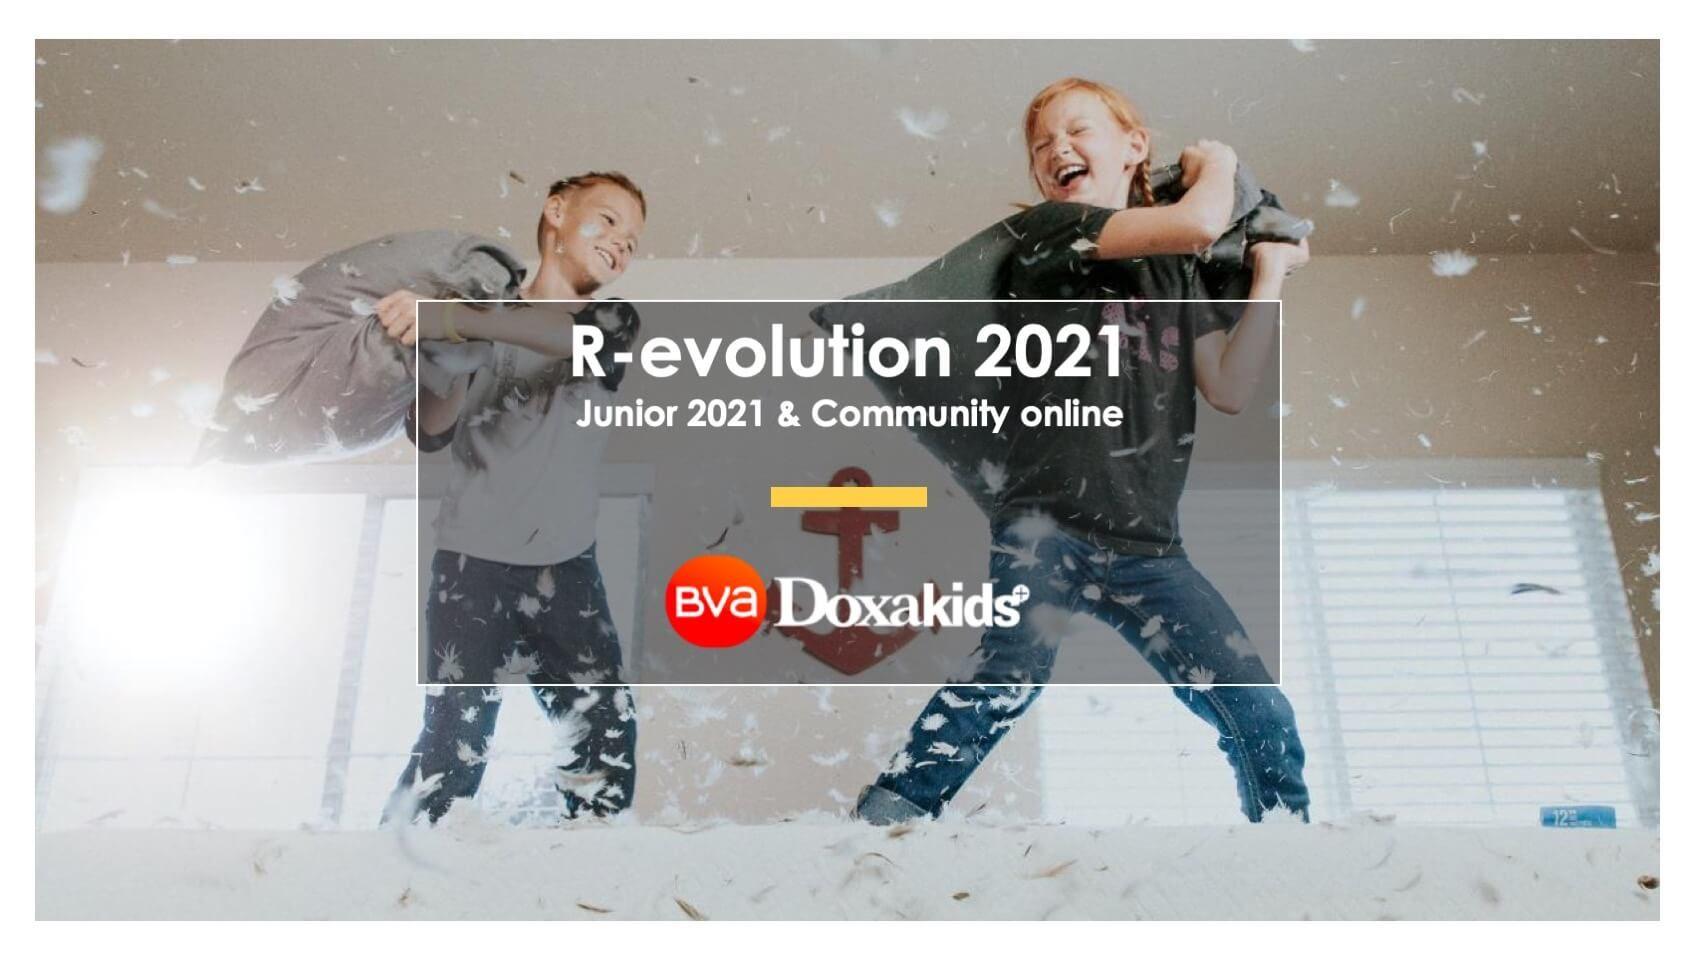 R Evolution 2021 Junior 2021 & Community Online 01